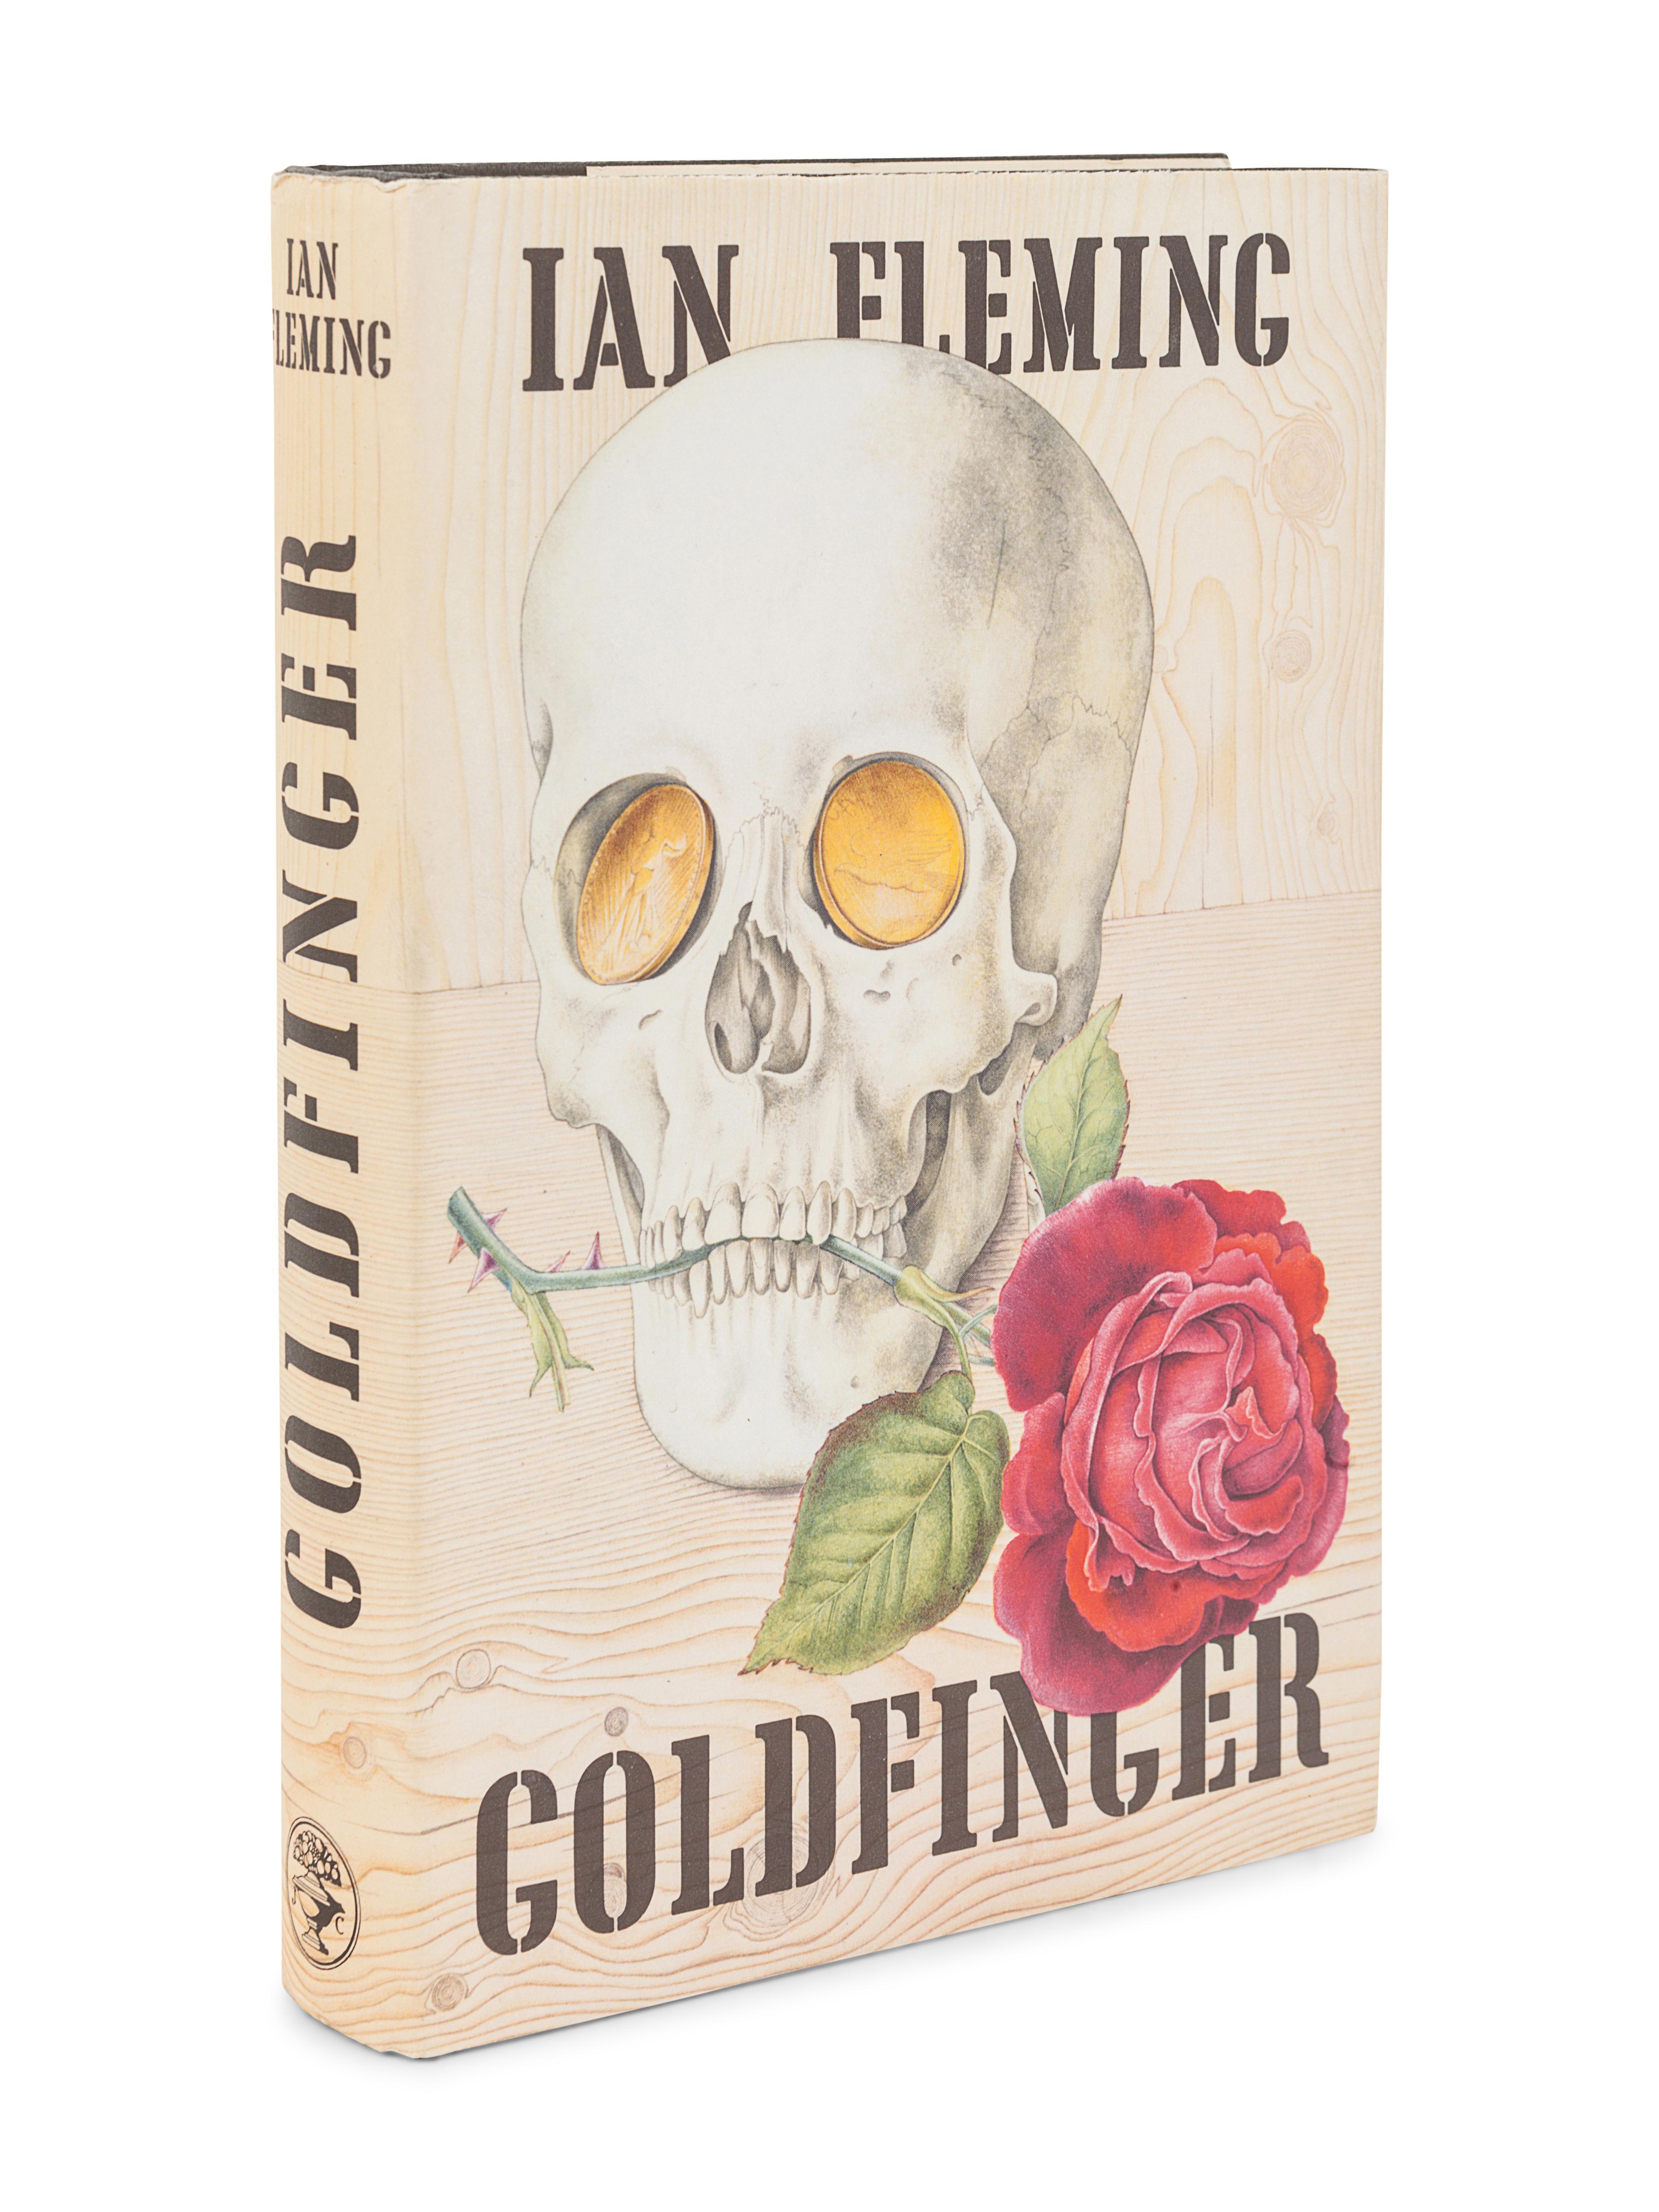 FLEMING, Ian (1908-1964). Goldfinger. London: Jonathan Cape, 1959.